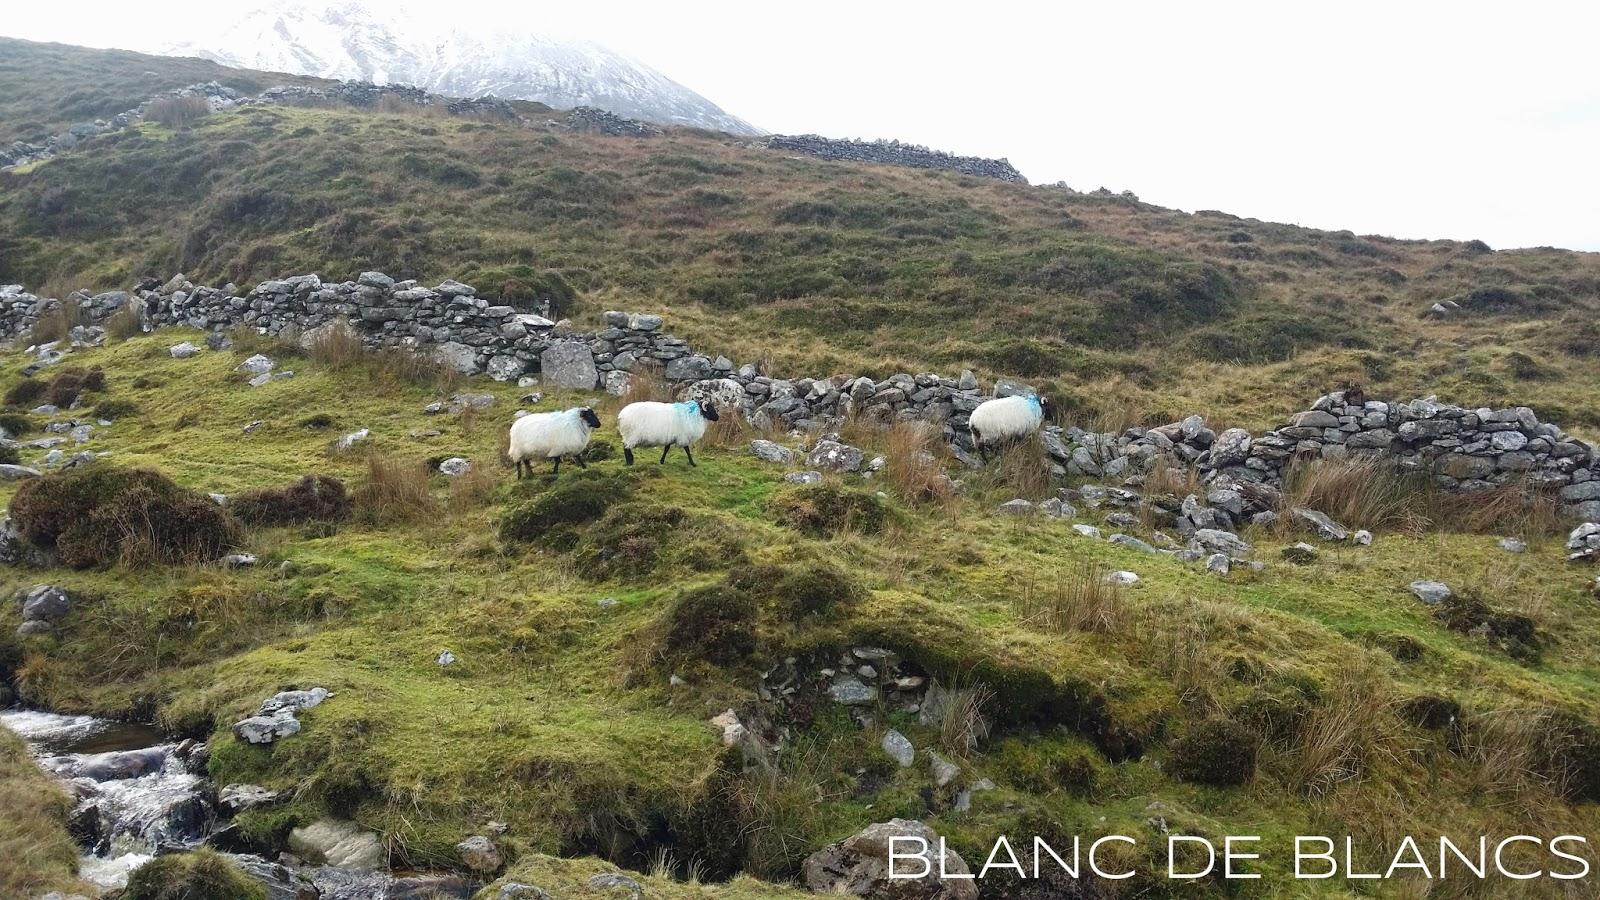 Irlantilaisia lampaita - www.blancdeblancs.fi